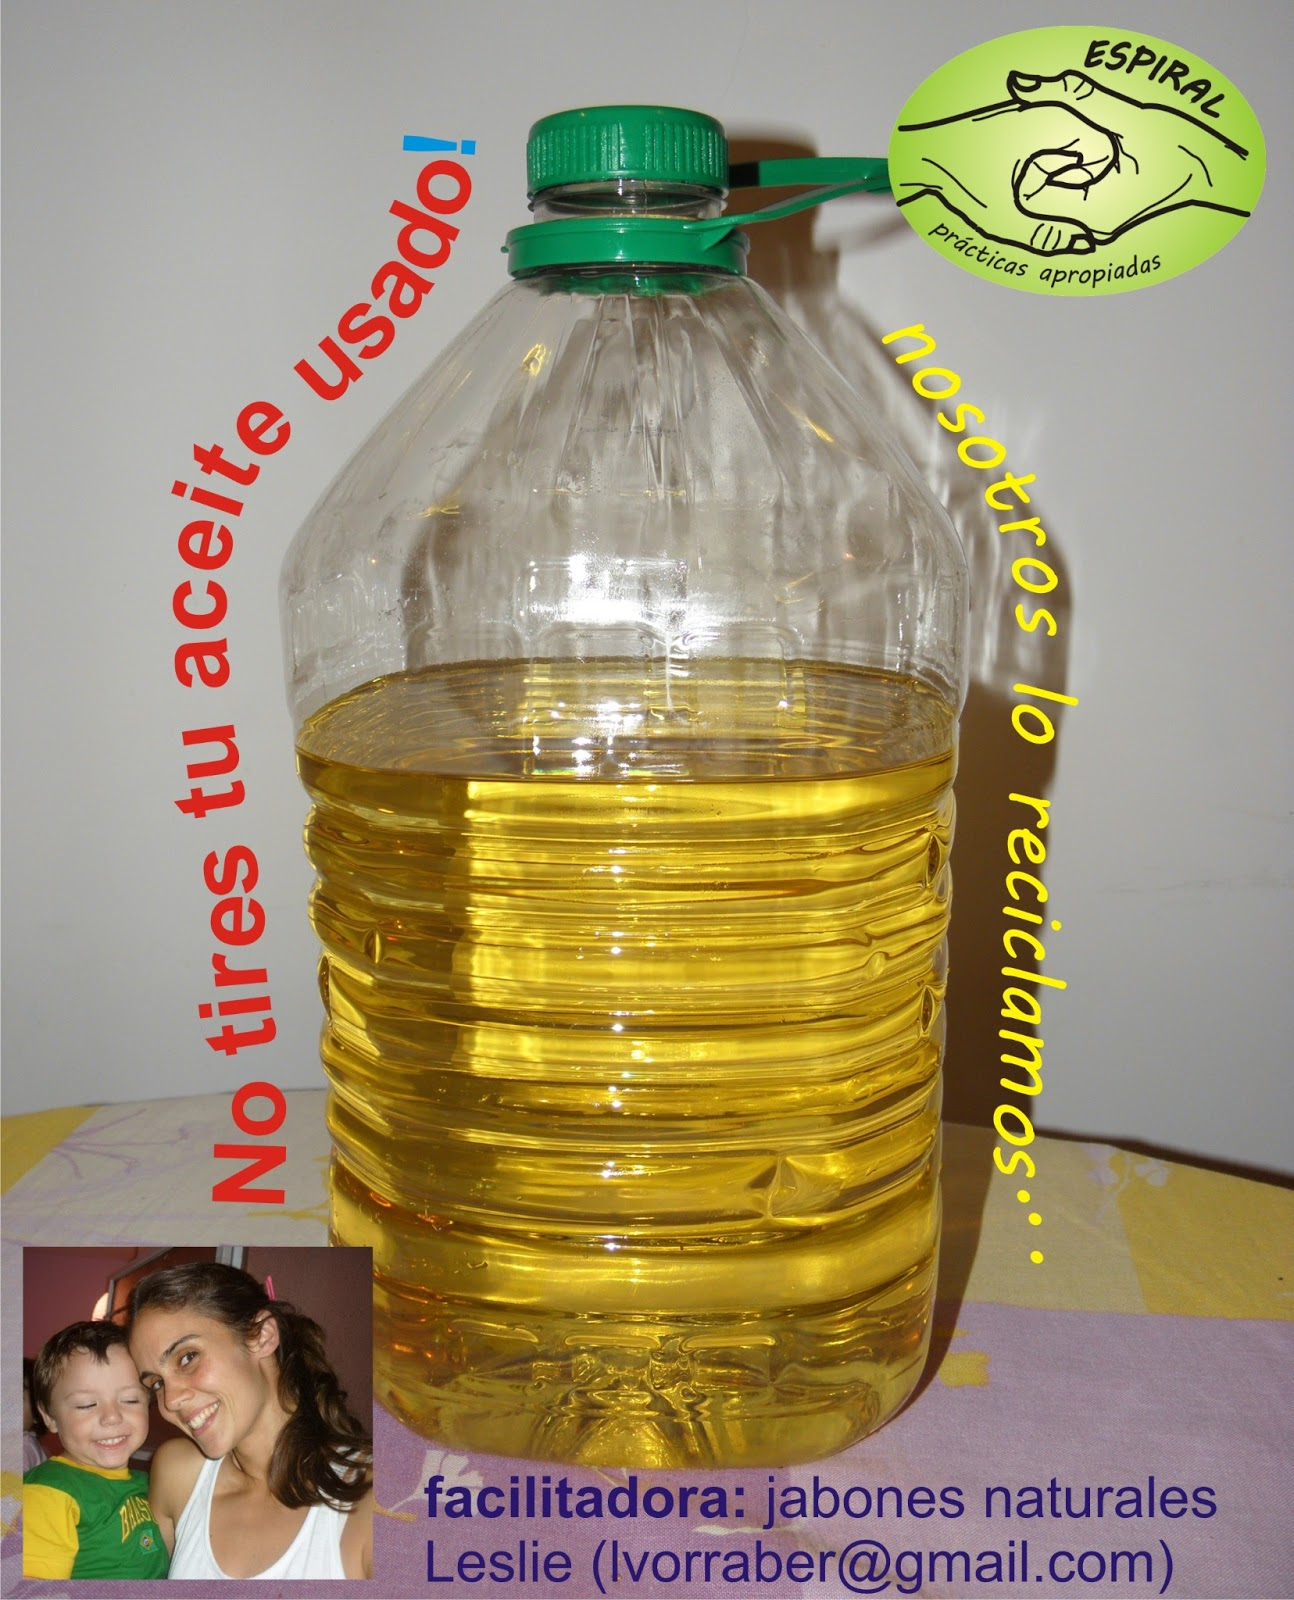 Espiral pr cticas apropiadas reciclamos tu aceite usado - Aceite usado de cocina ...